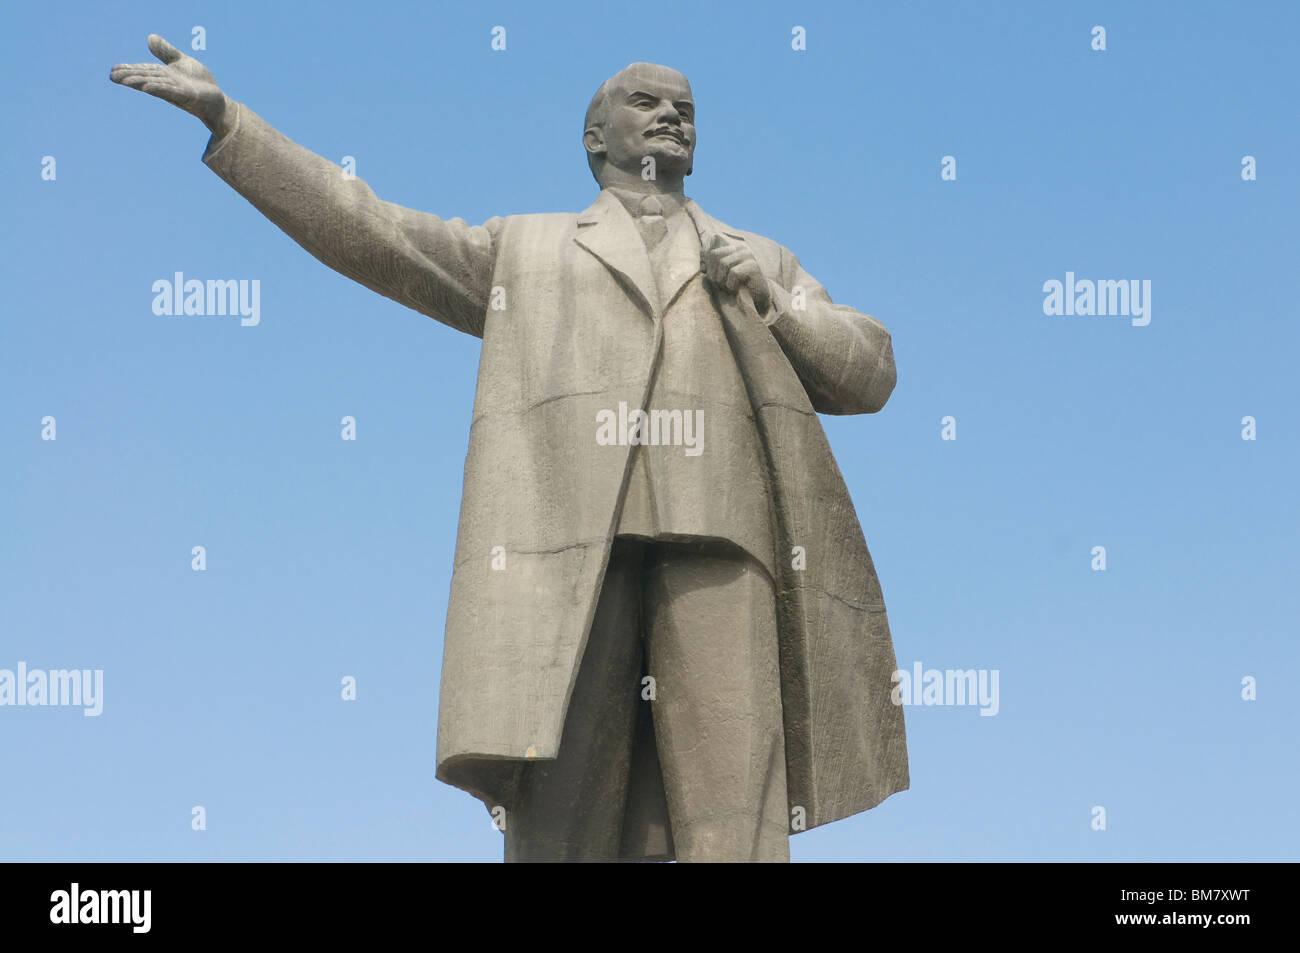 Statue of Lenin, Osh, Kyrgyzstan Stock Photo